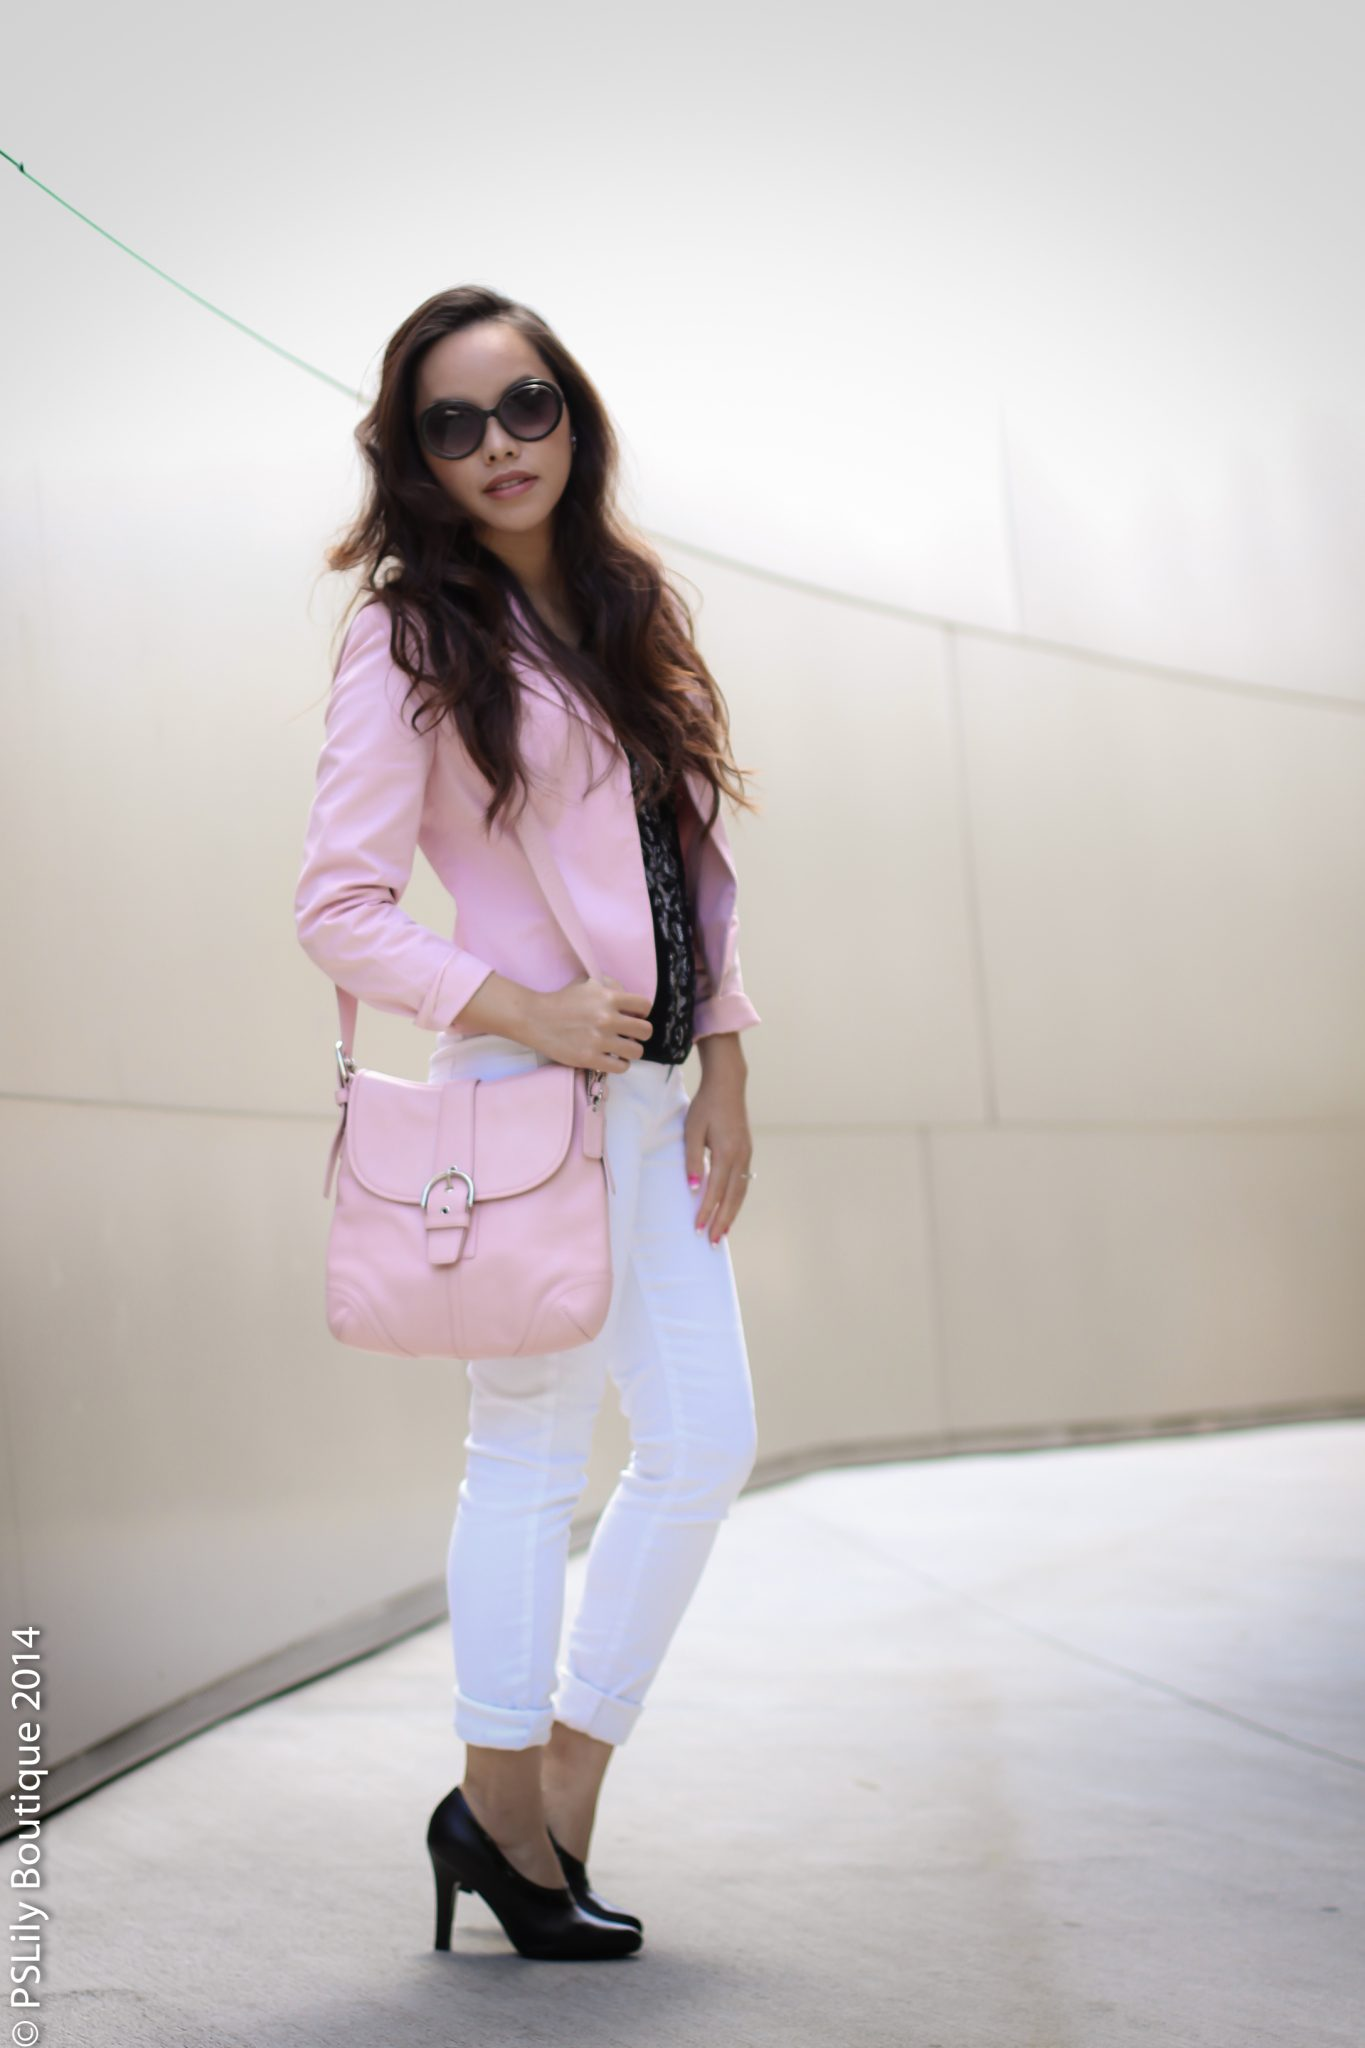 instagram-pslilyboutique-los-angeles-fashion-blogger